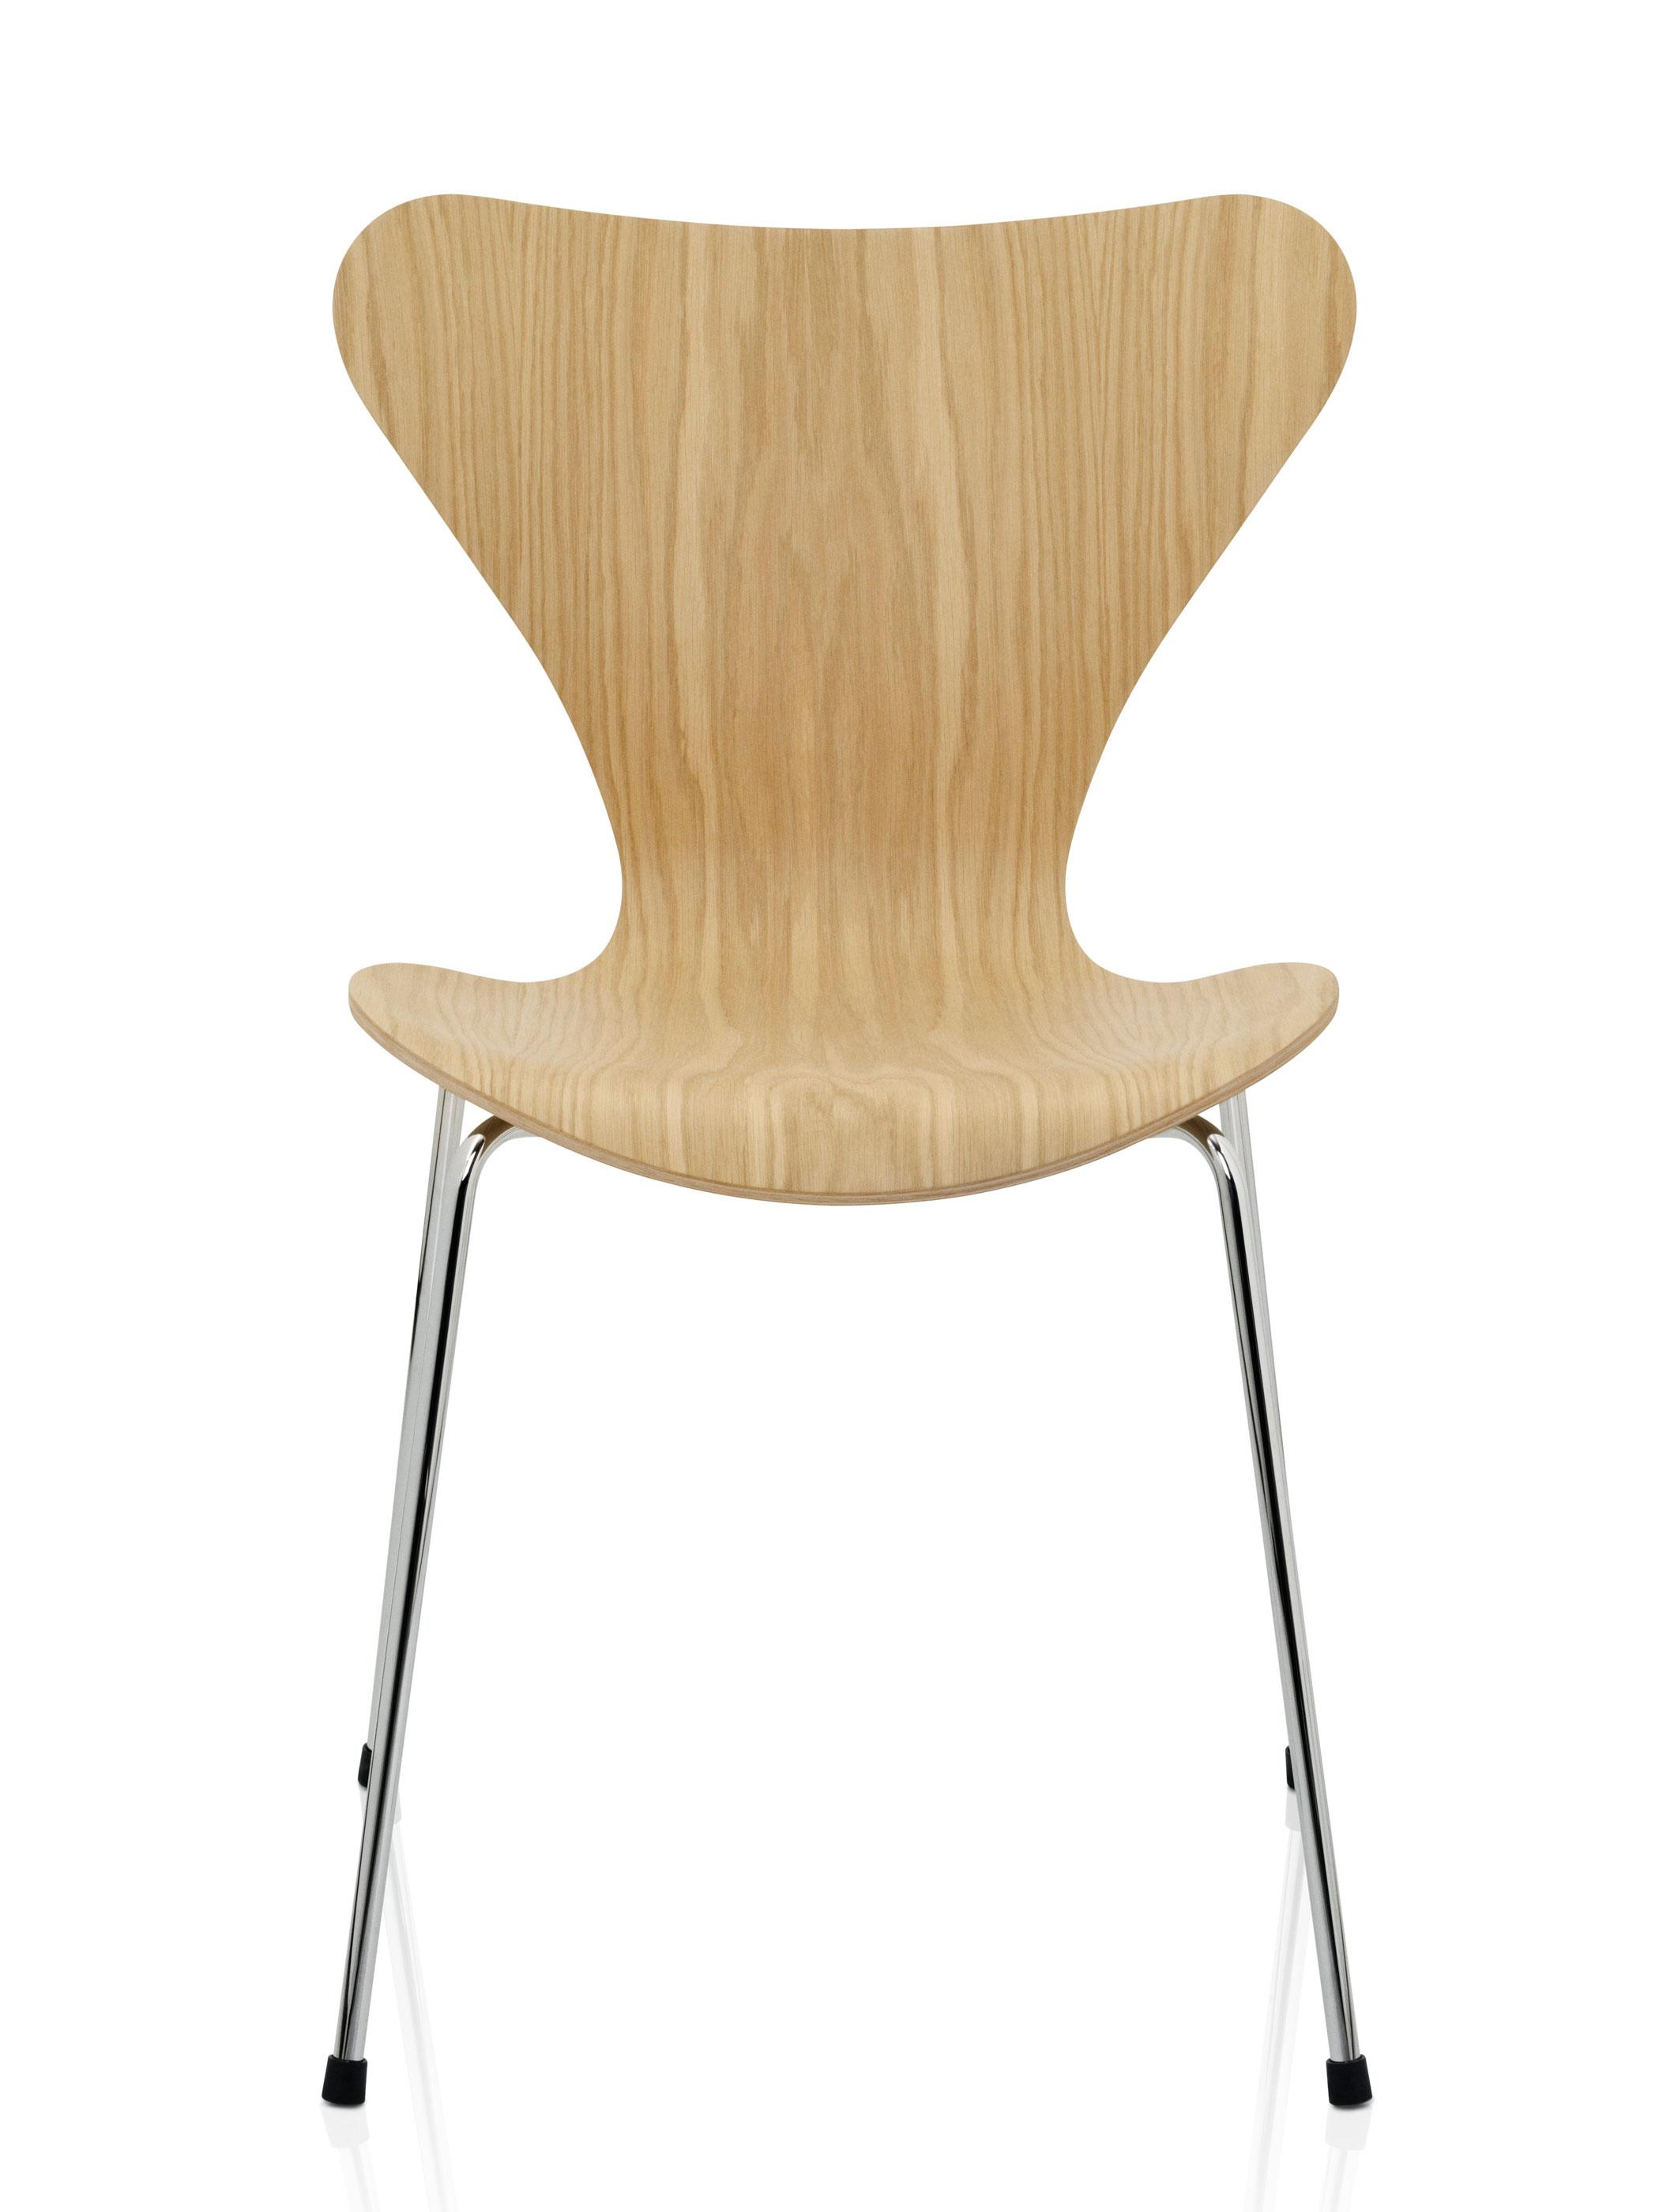 fritz hansen serie 7 3107 eiche produktdetails. Black Bedroom Furniture Sets. Home Design Ideas